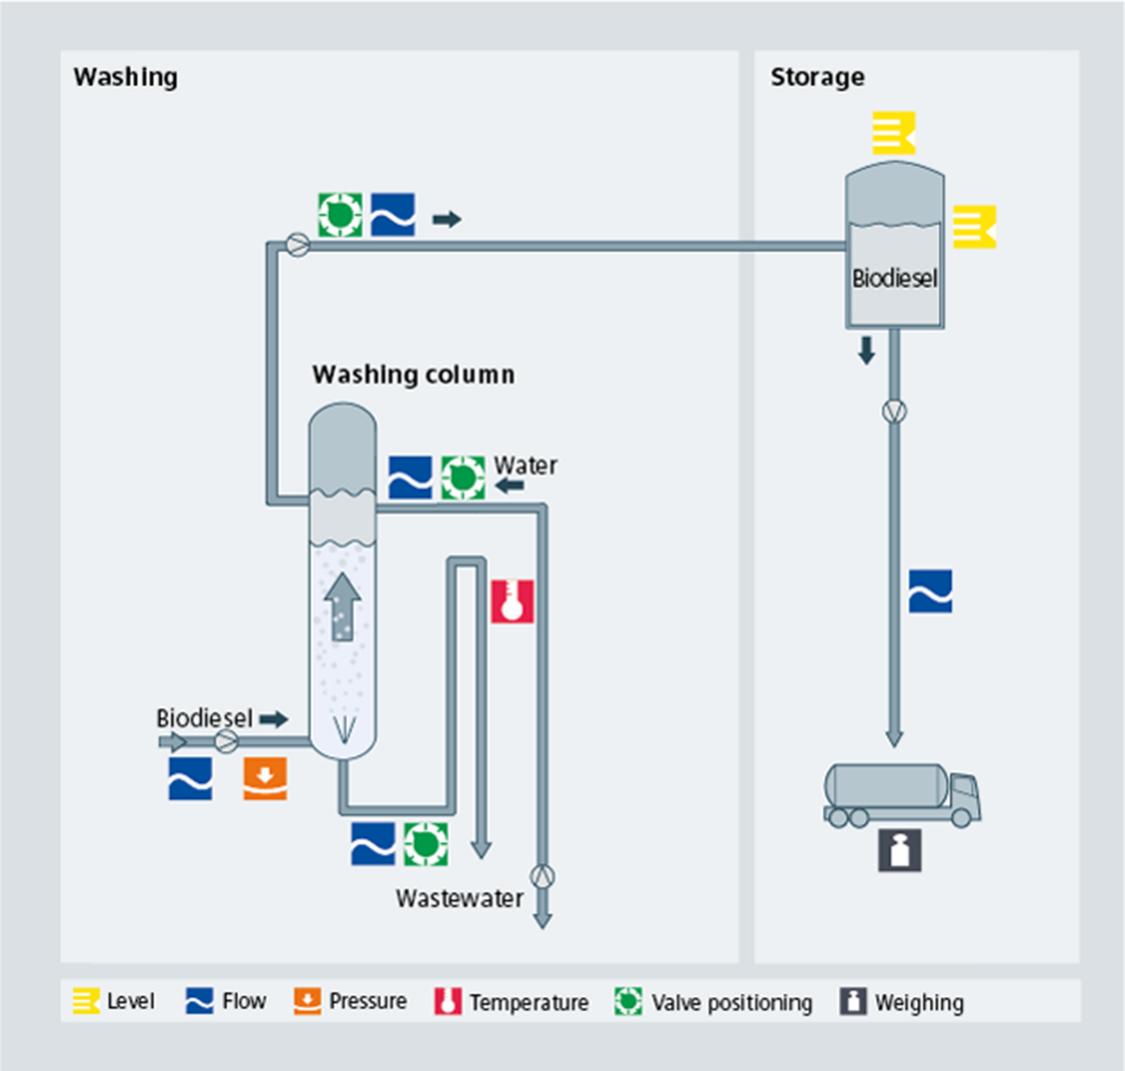 Biodiesel - Washing process diagram - Siemens USA